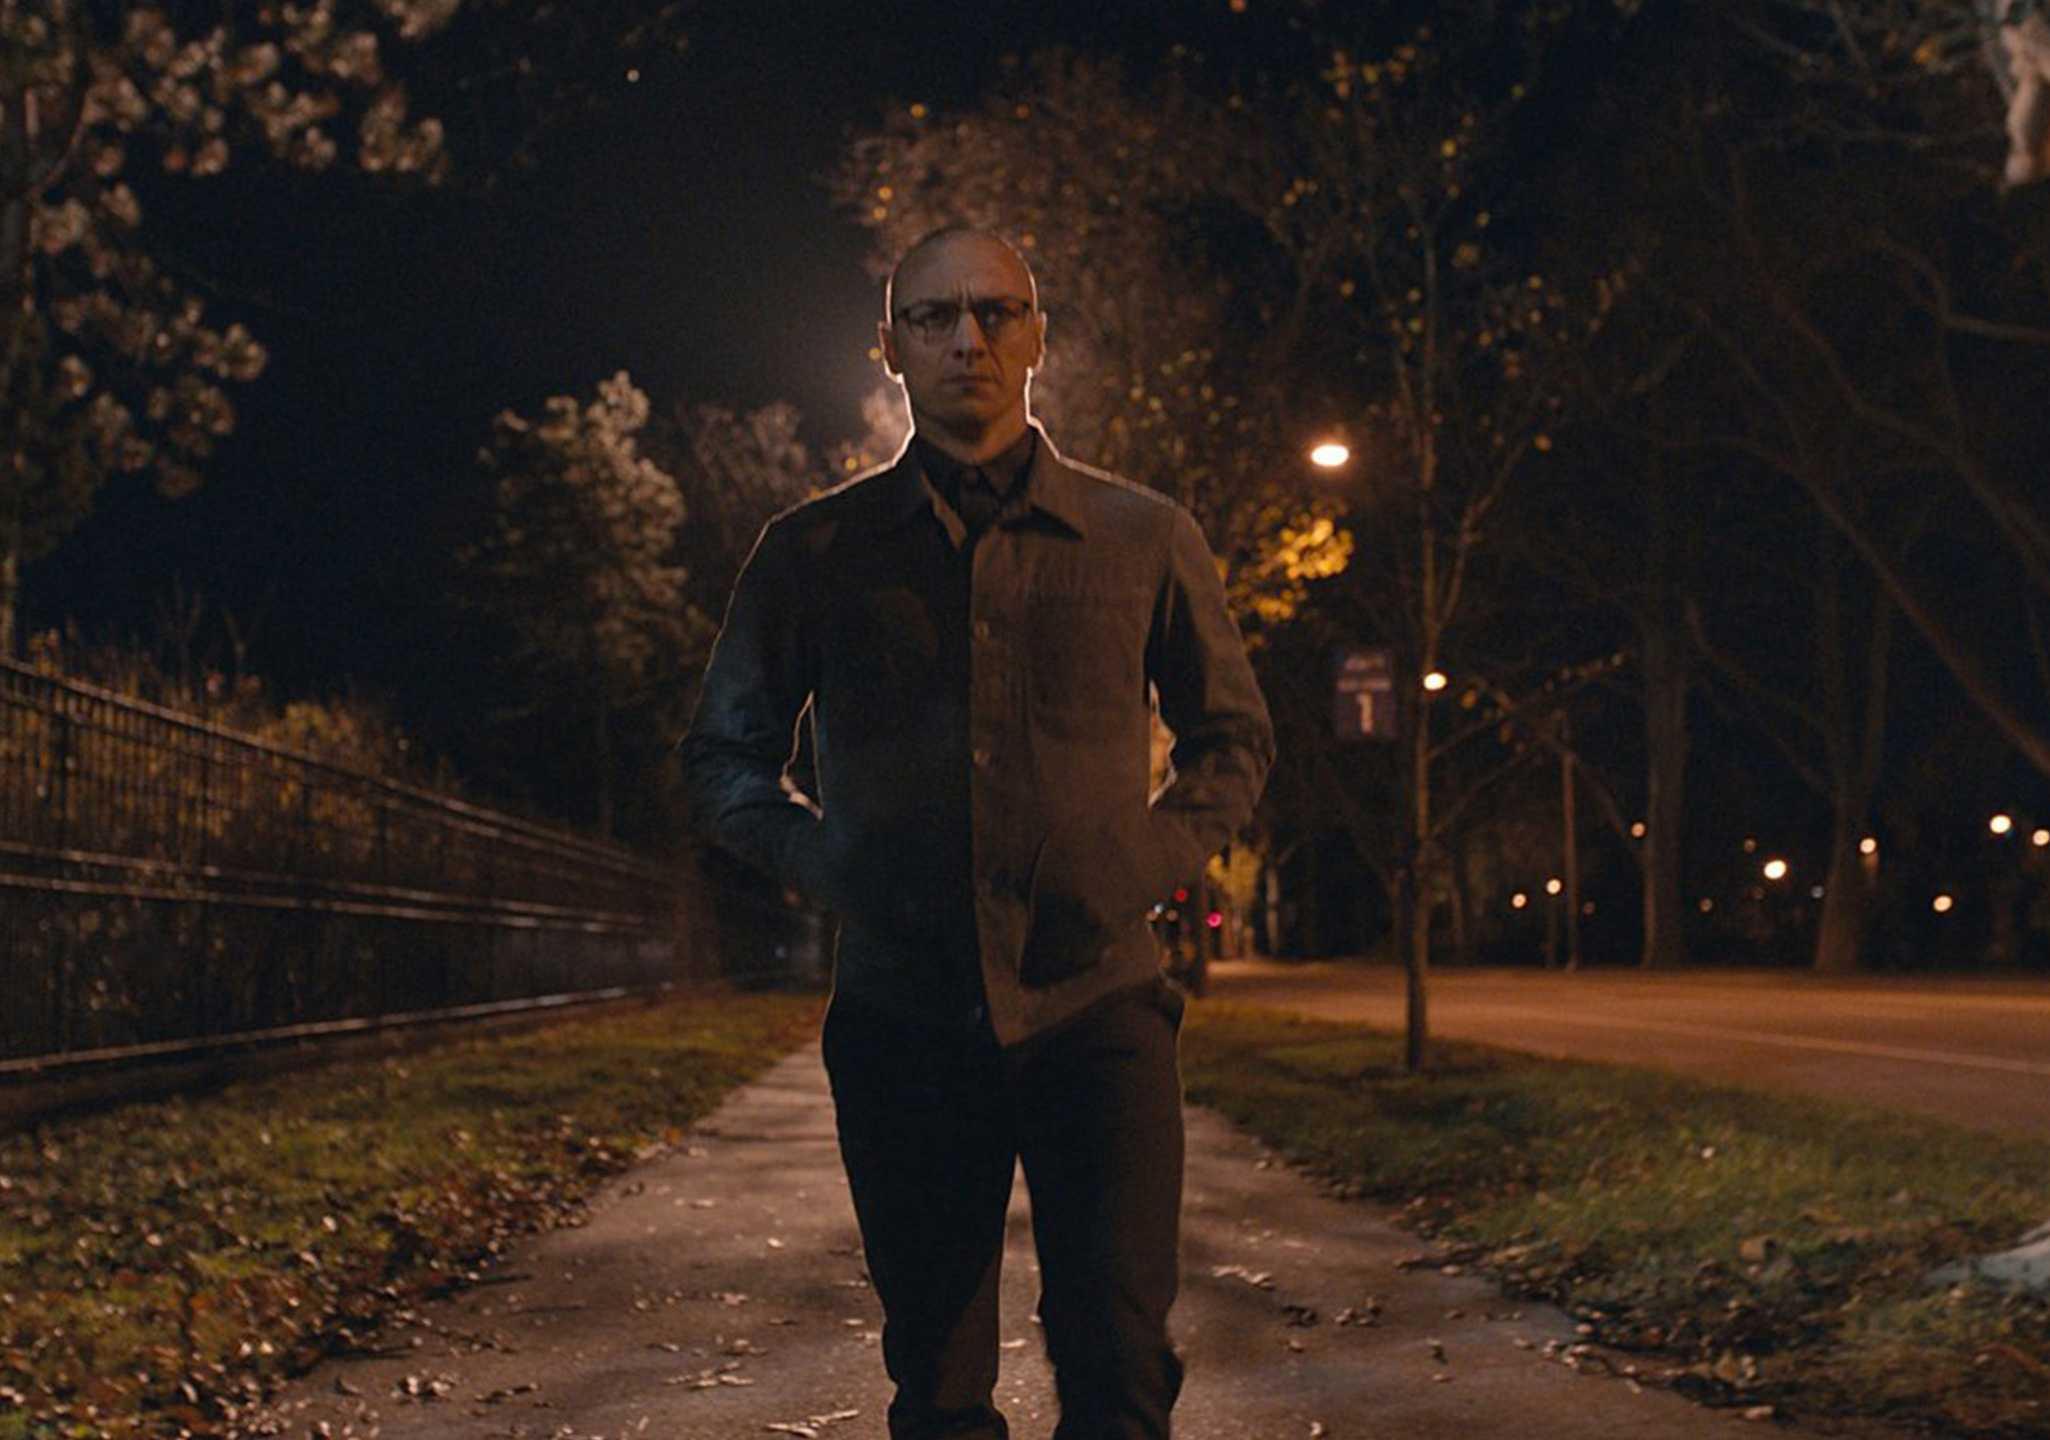 M. Night Shyamalan's most recent directorial effort